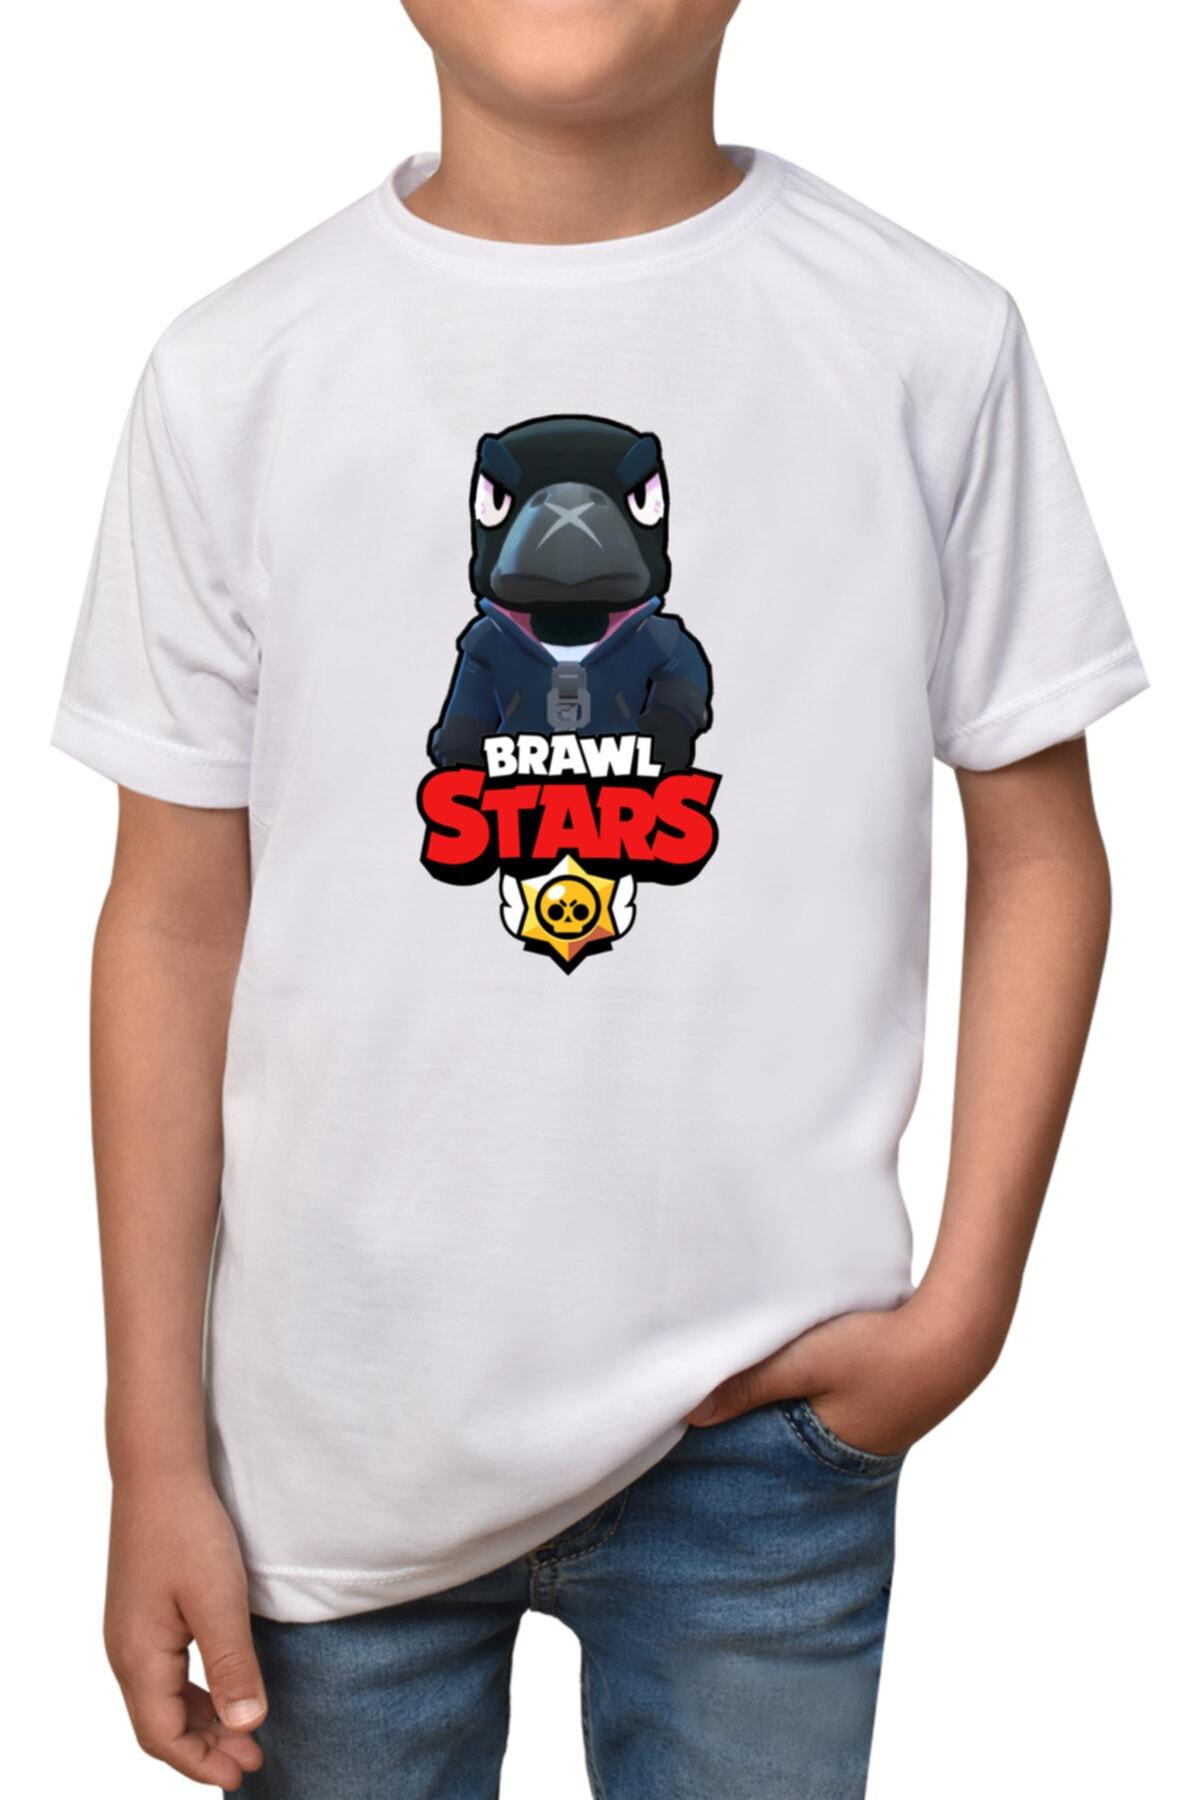 Brawl Stars - Crow- Beyaz Çocuk -  T-shirt T-3